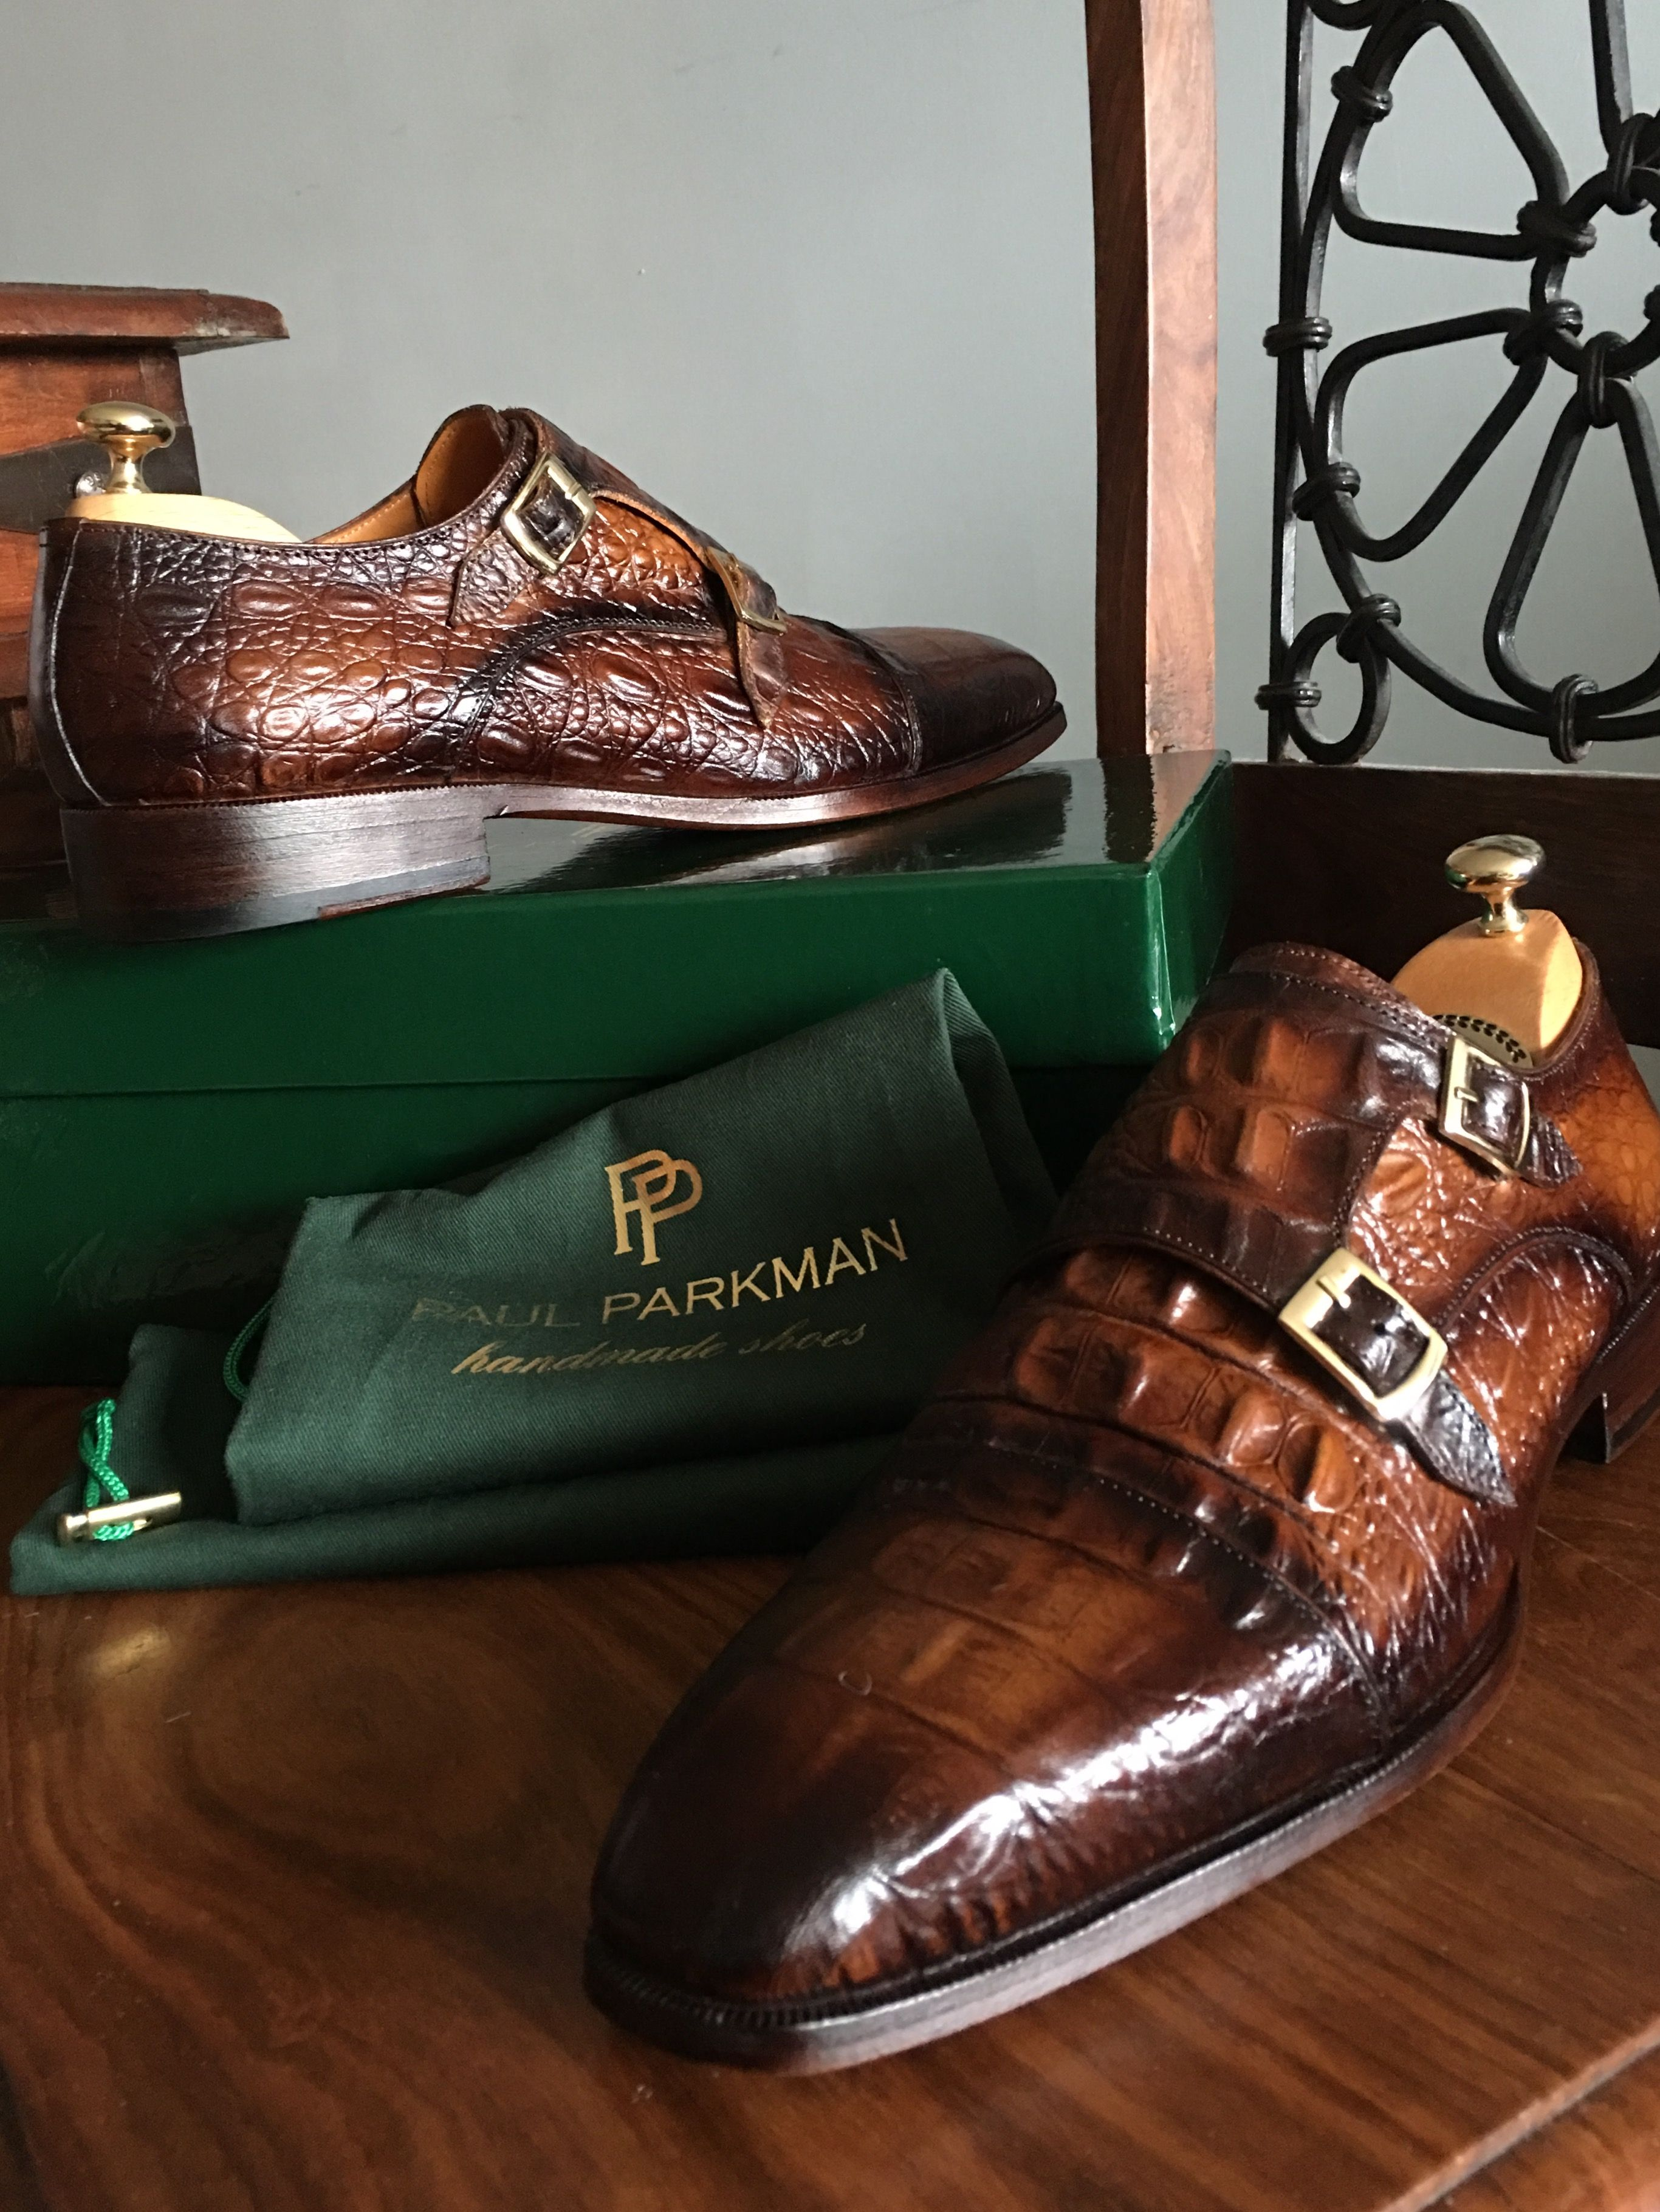 61e6786764ea3 Paul Parkman Men's Brown Crocodile Embossed Calfskin Double ...